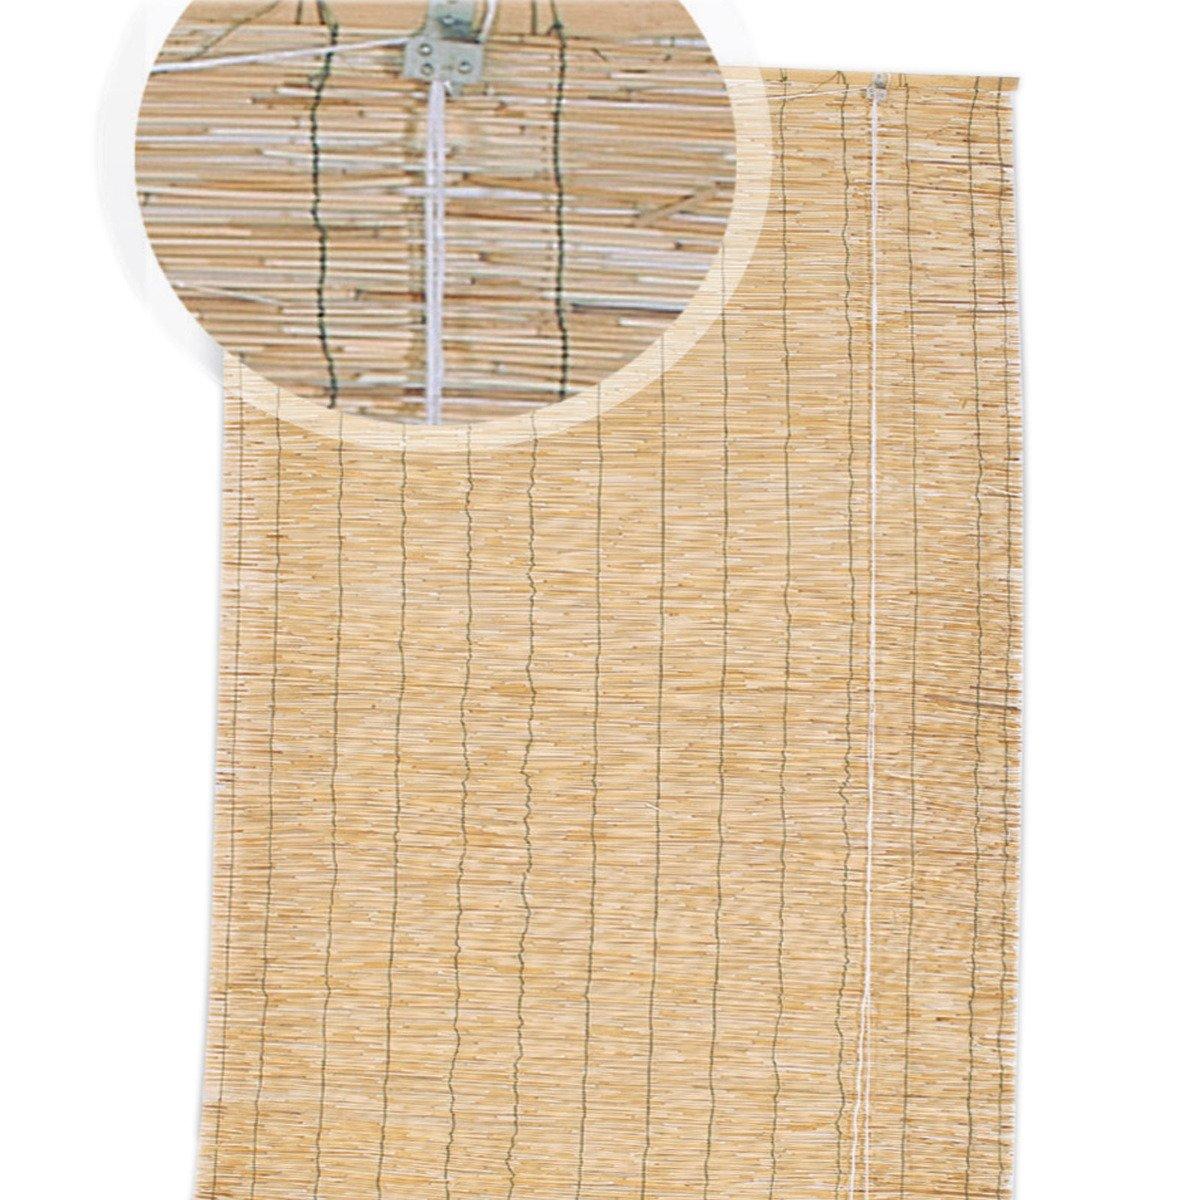 EV Arella Tapparella, Bambú, Beige, 120x260x0.5 cm